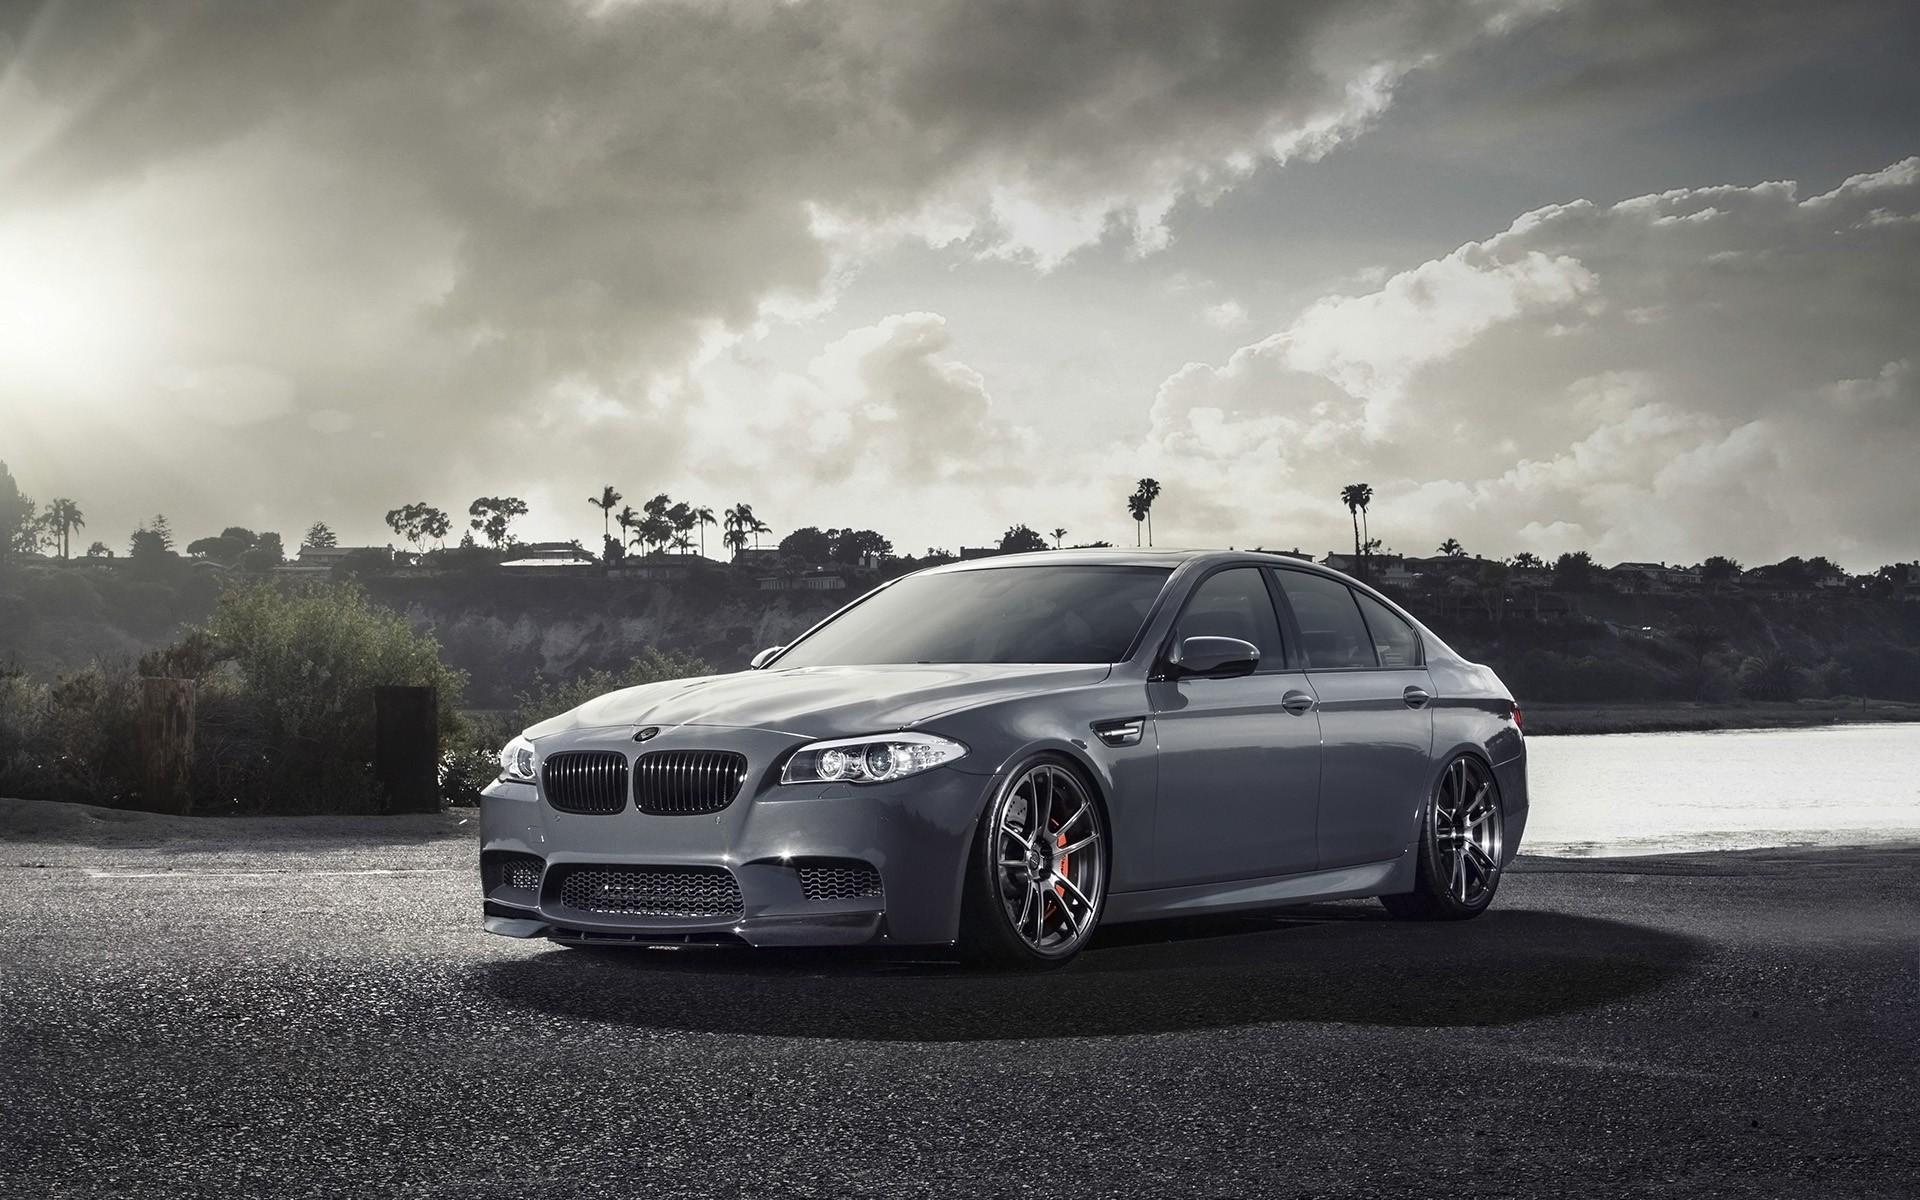 2013 BMW M5 By Vorsteiner Wallpaper | HD Car Wallpapers | ID #3777